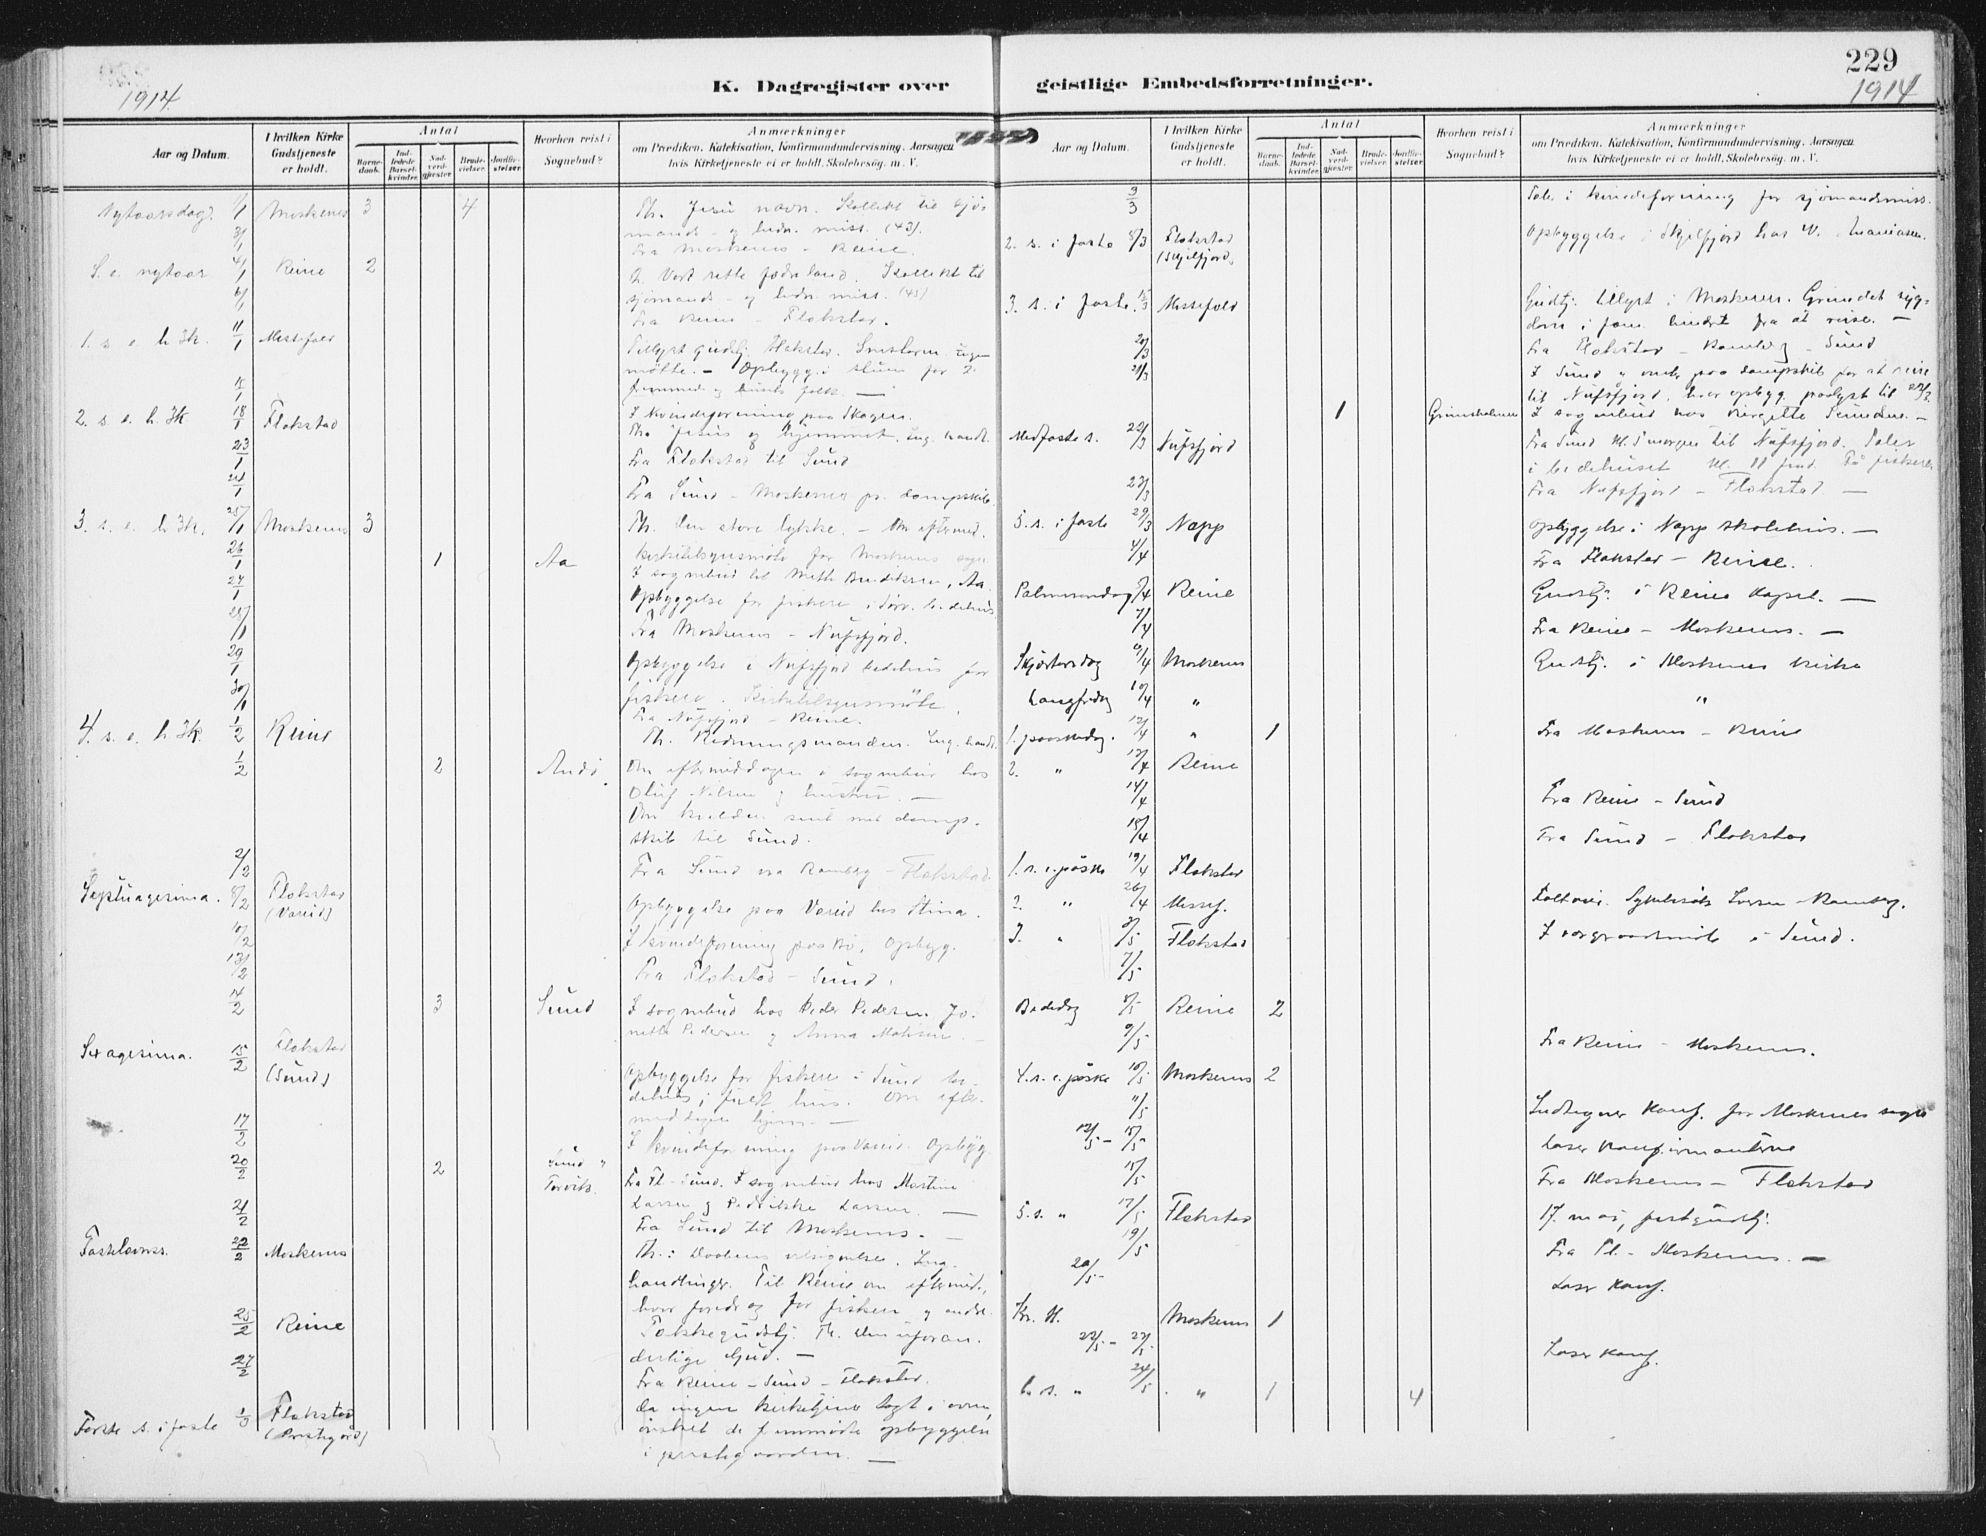 SAT, Ministerialprotokoller, klokkerbøker og fødselsregistre - Nordland, 885/L1206: Ministerialbok nr. 885A07, 1905-1915, s. 229